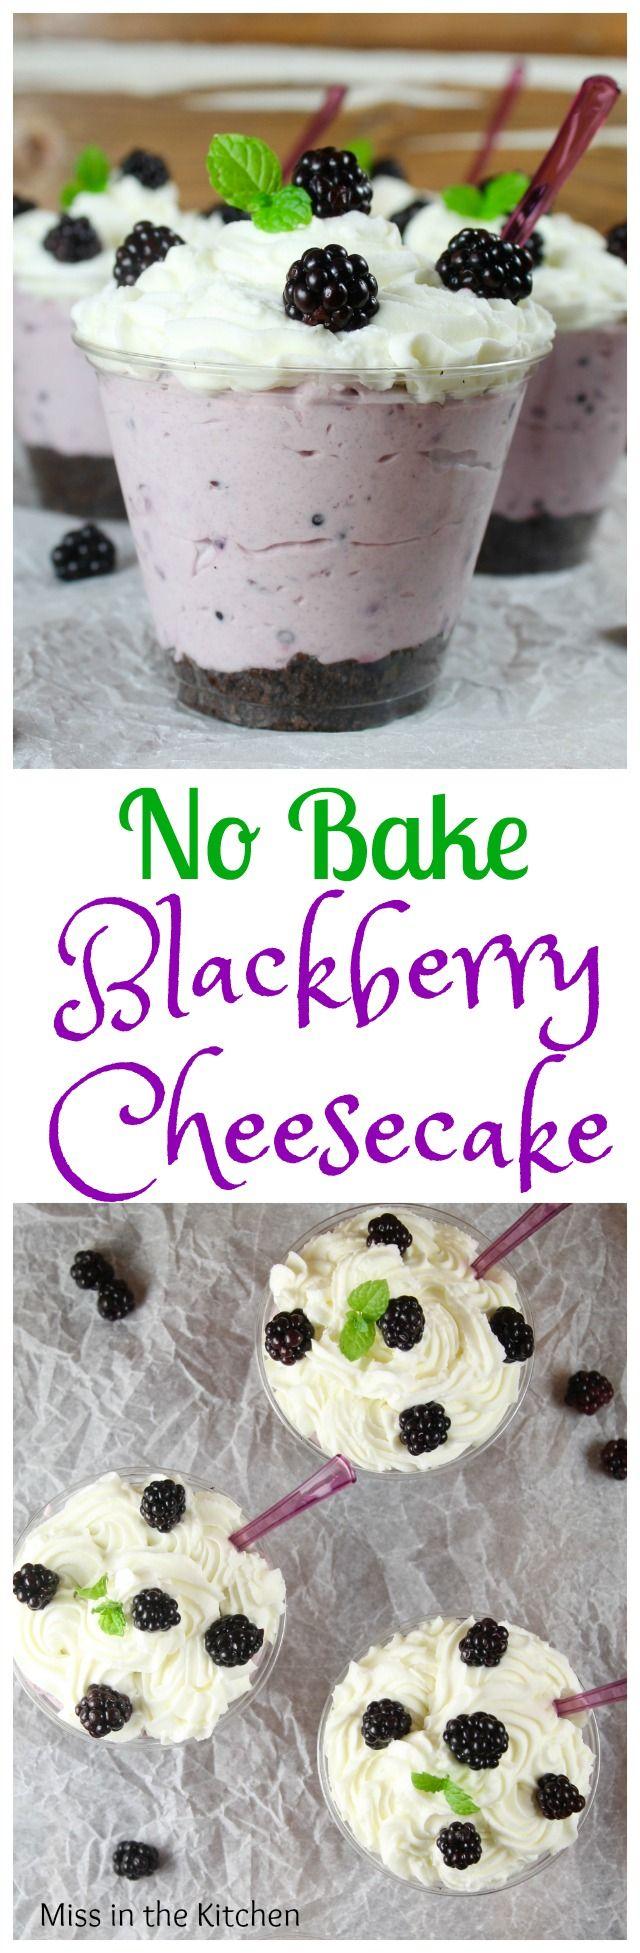 Pinterest Blackberry Recipe Image